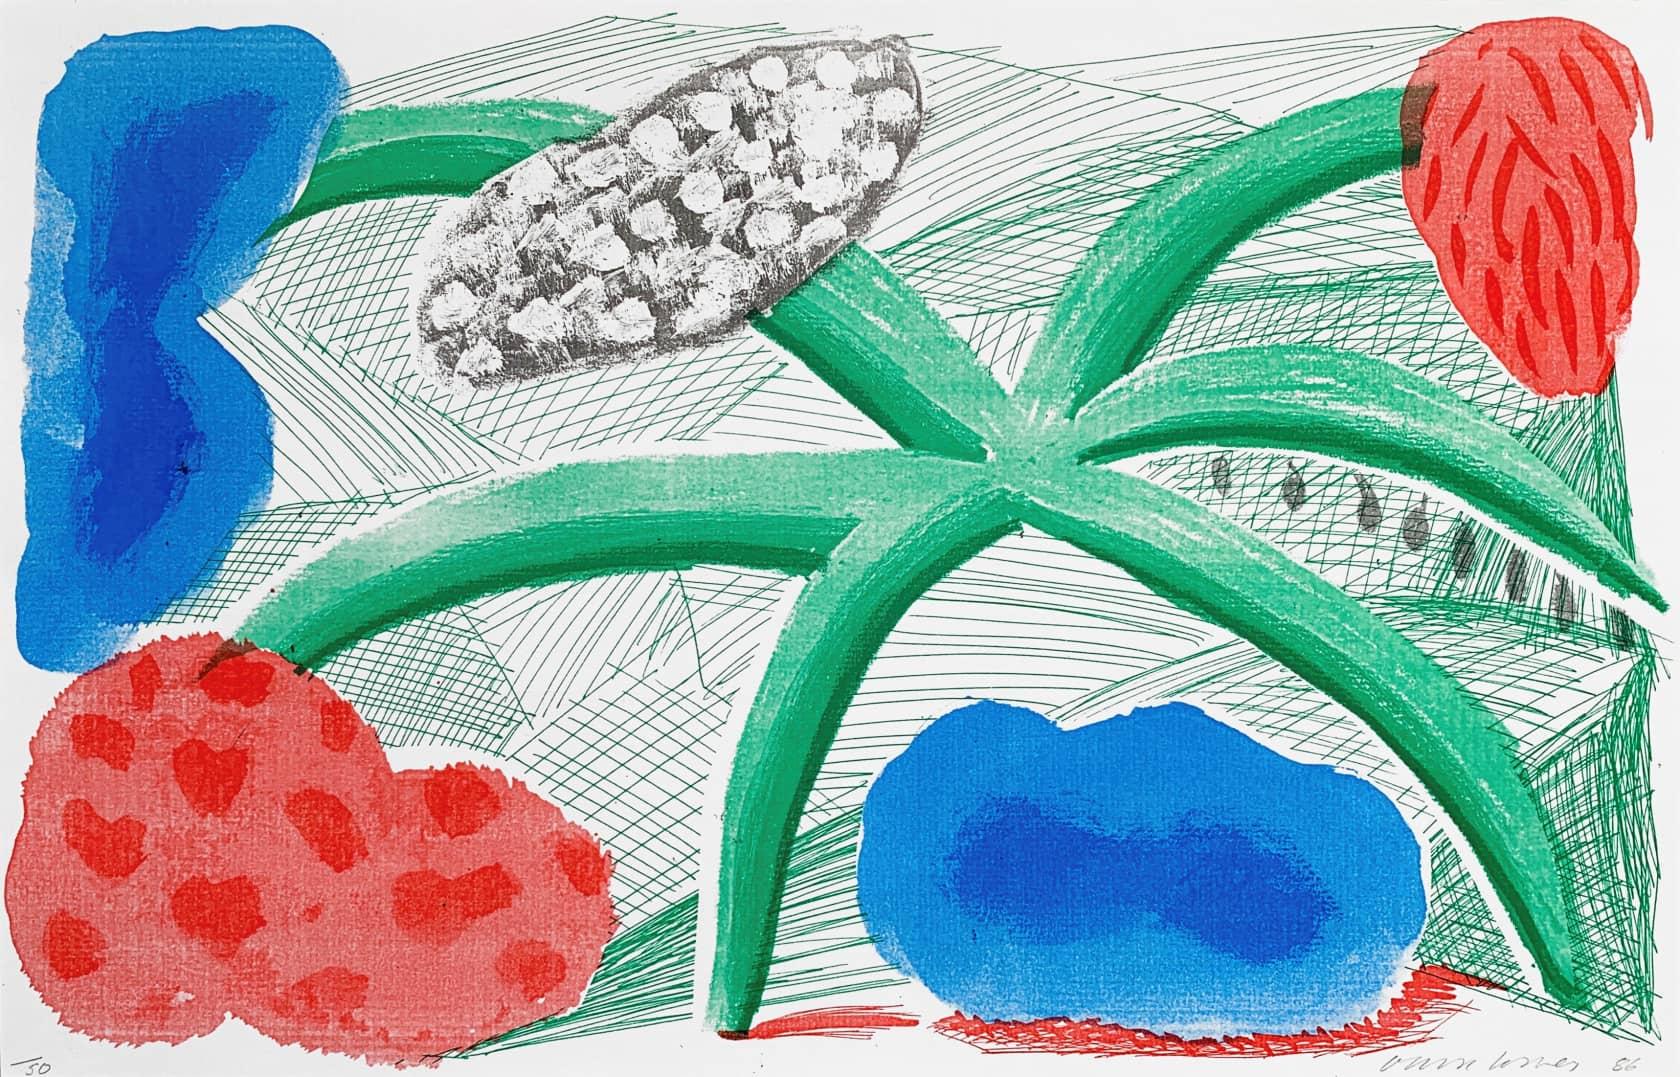 David Hockney Landscape With A Plant Screenprint